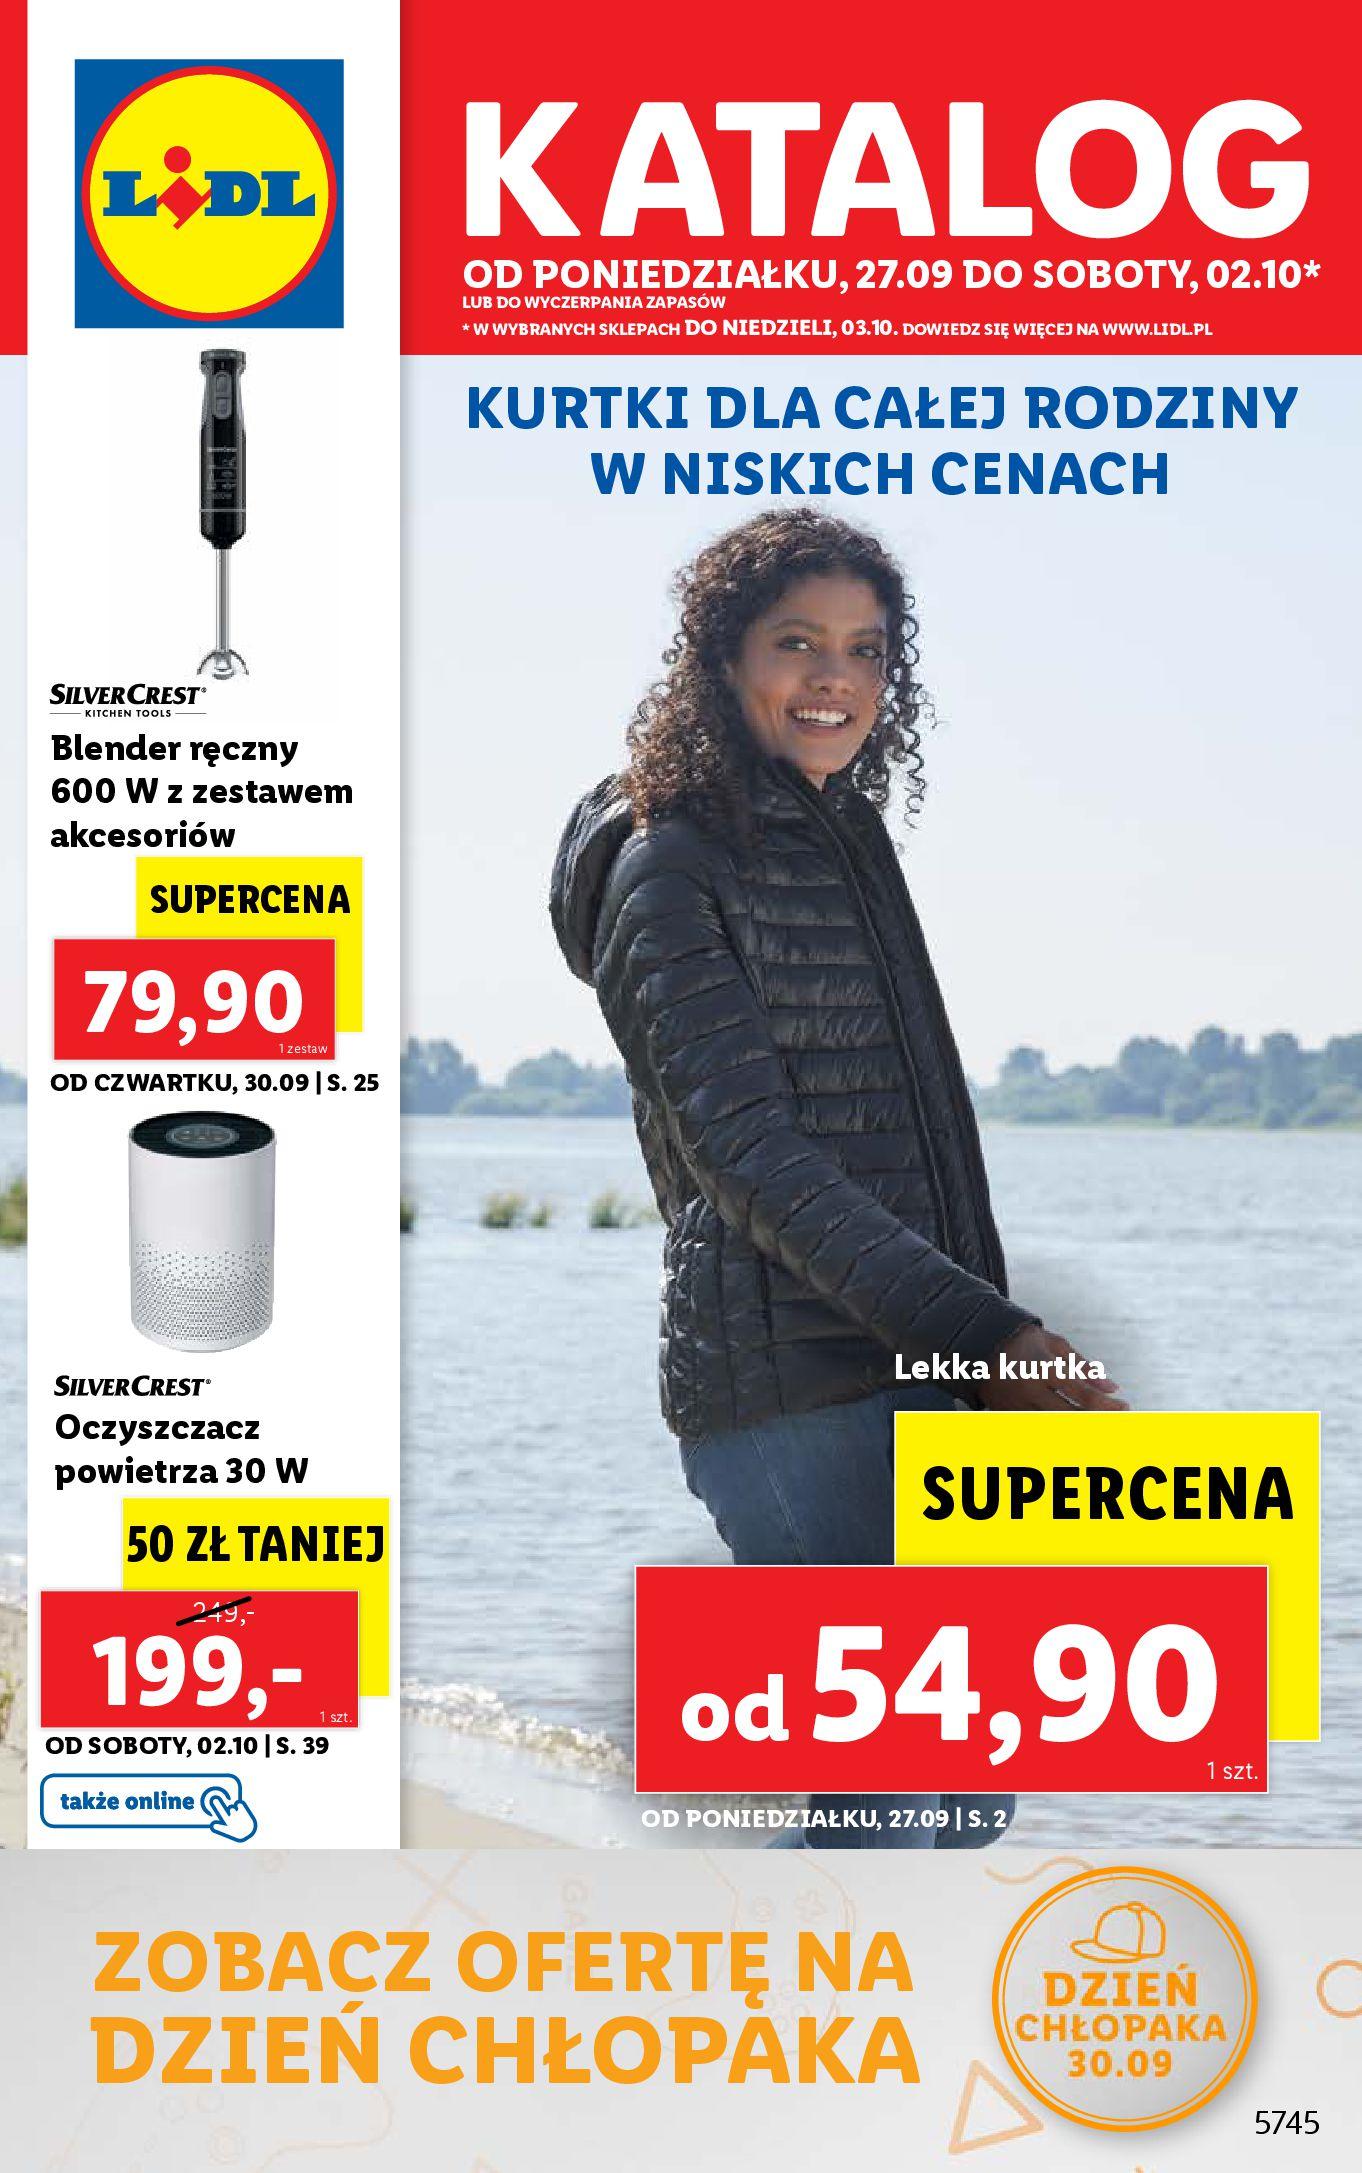 Gazetka Lidl: Gazetka Lidl - Katalog od 27.09 - 26.09.2021